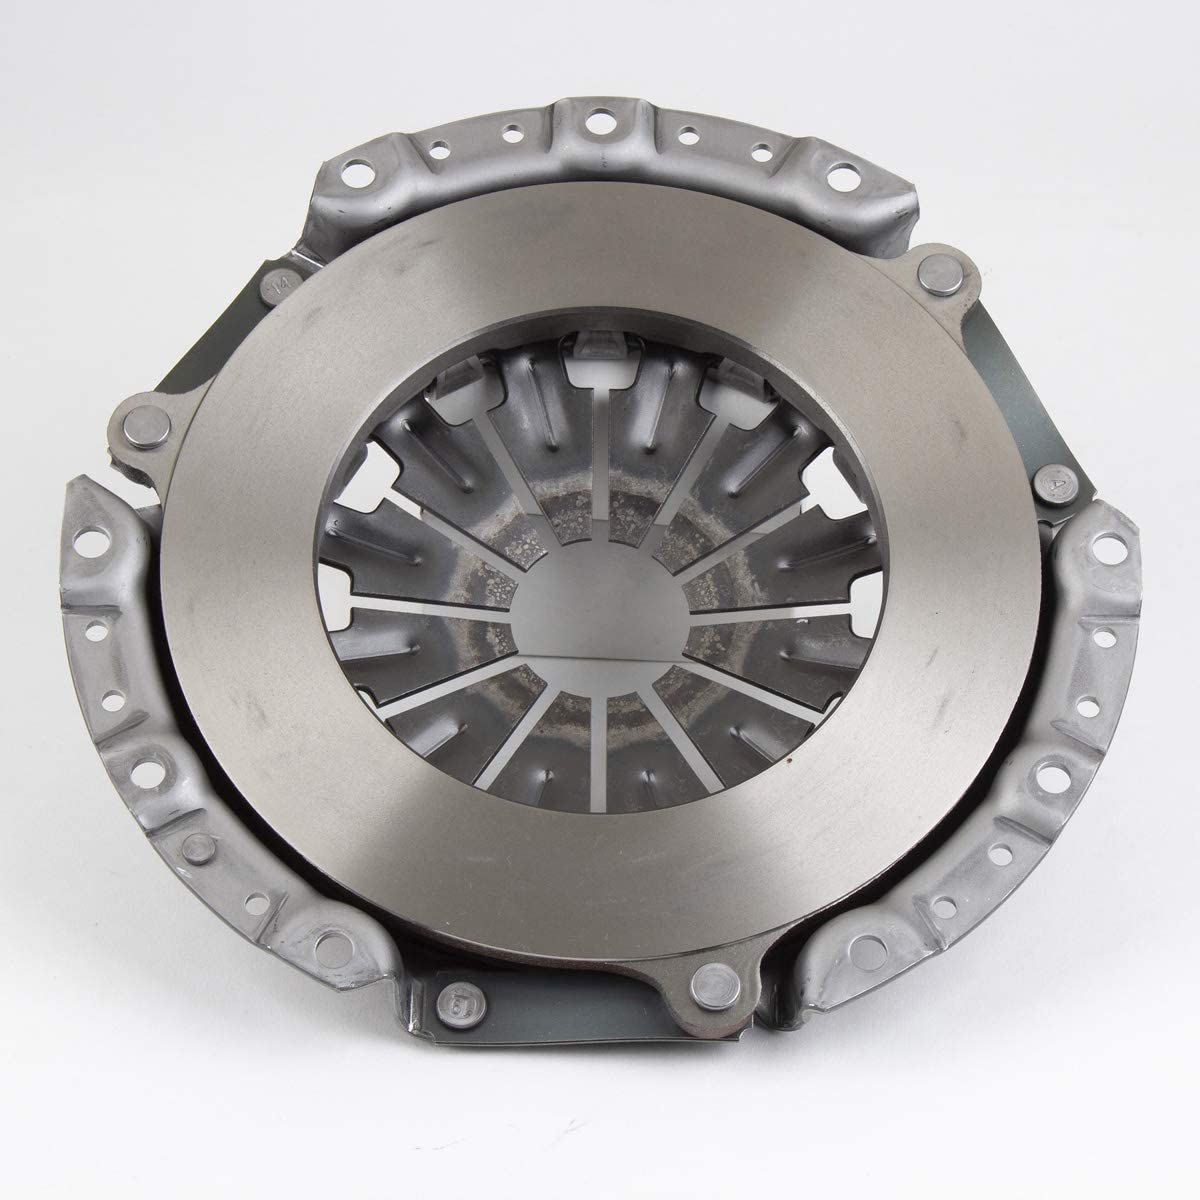 Genuine Hyundai 41300-26010 Clutch Cover Assembly